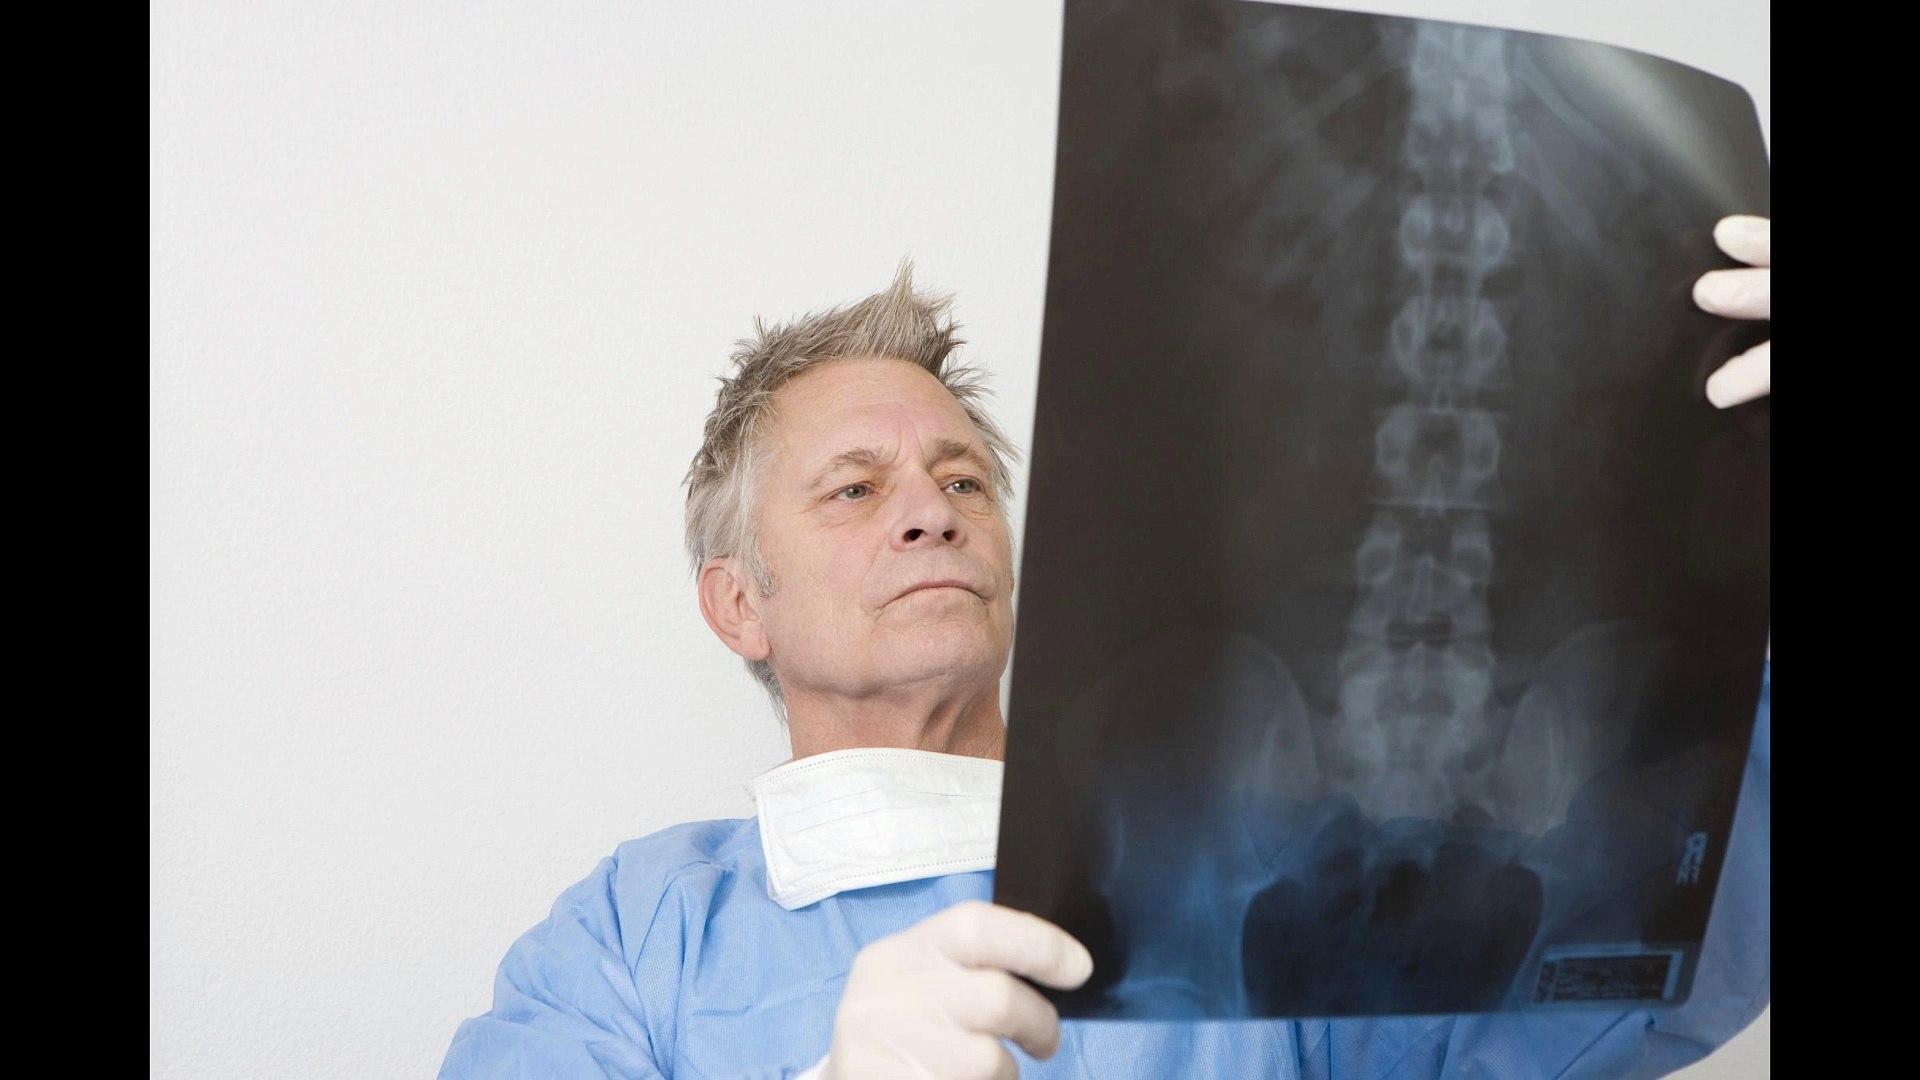 Goldsboro Chiropractic - Smart Tips When Choosing A Chiropractor